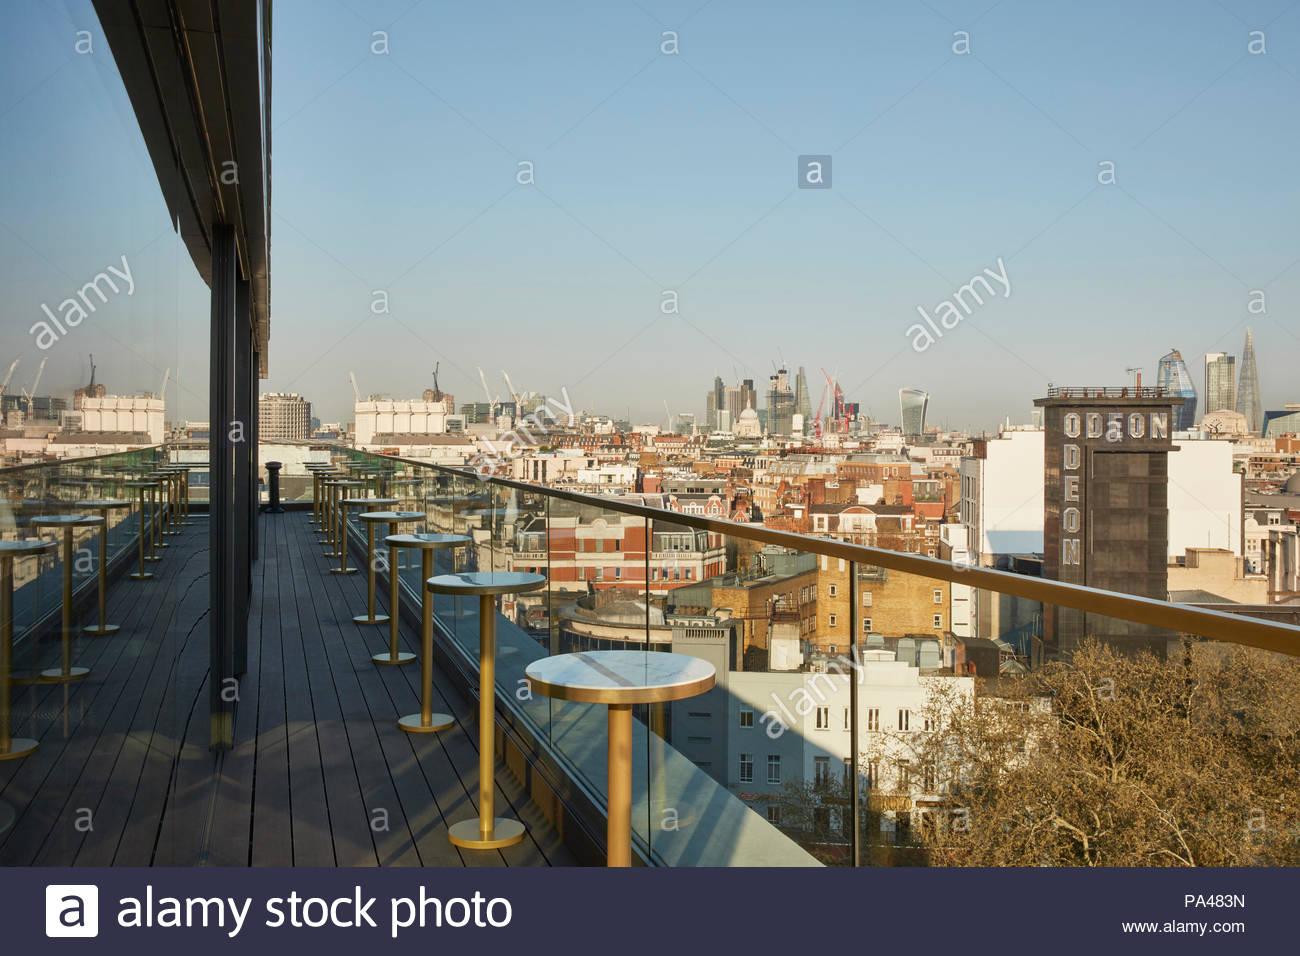 Rooftop bar. Indigo Hotel, Leicester Square, London, United Kingdom. Architect: Michaelis Boyd Associates Ltd, 2018. - Stock Image